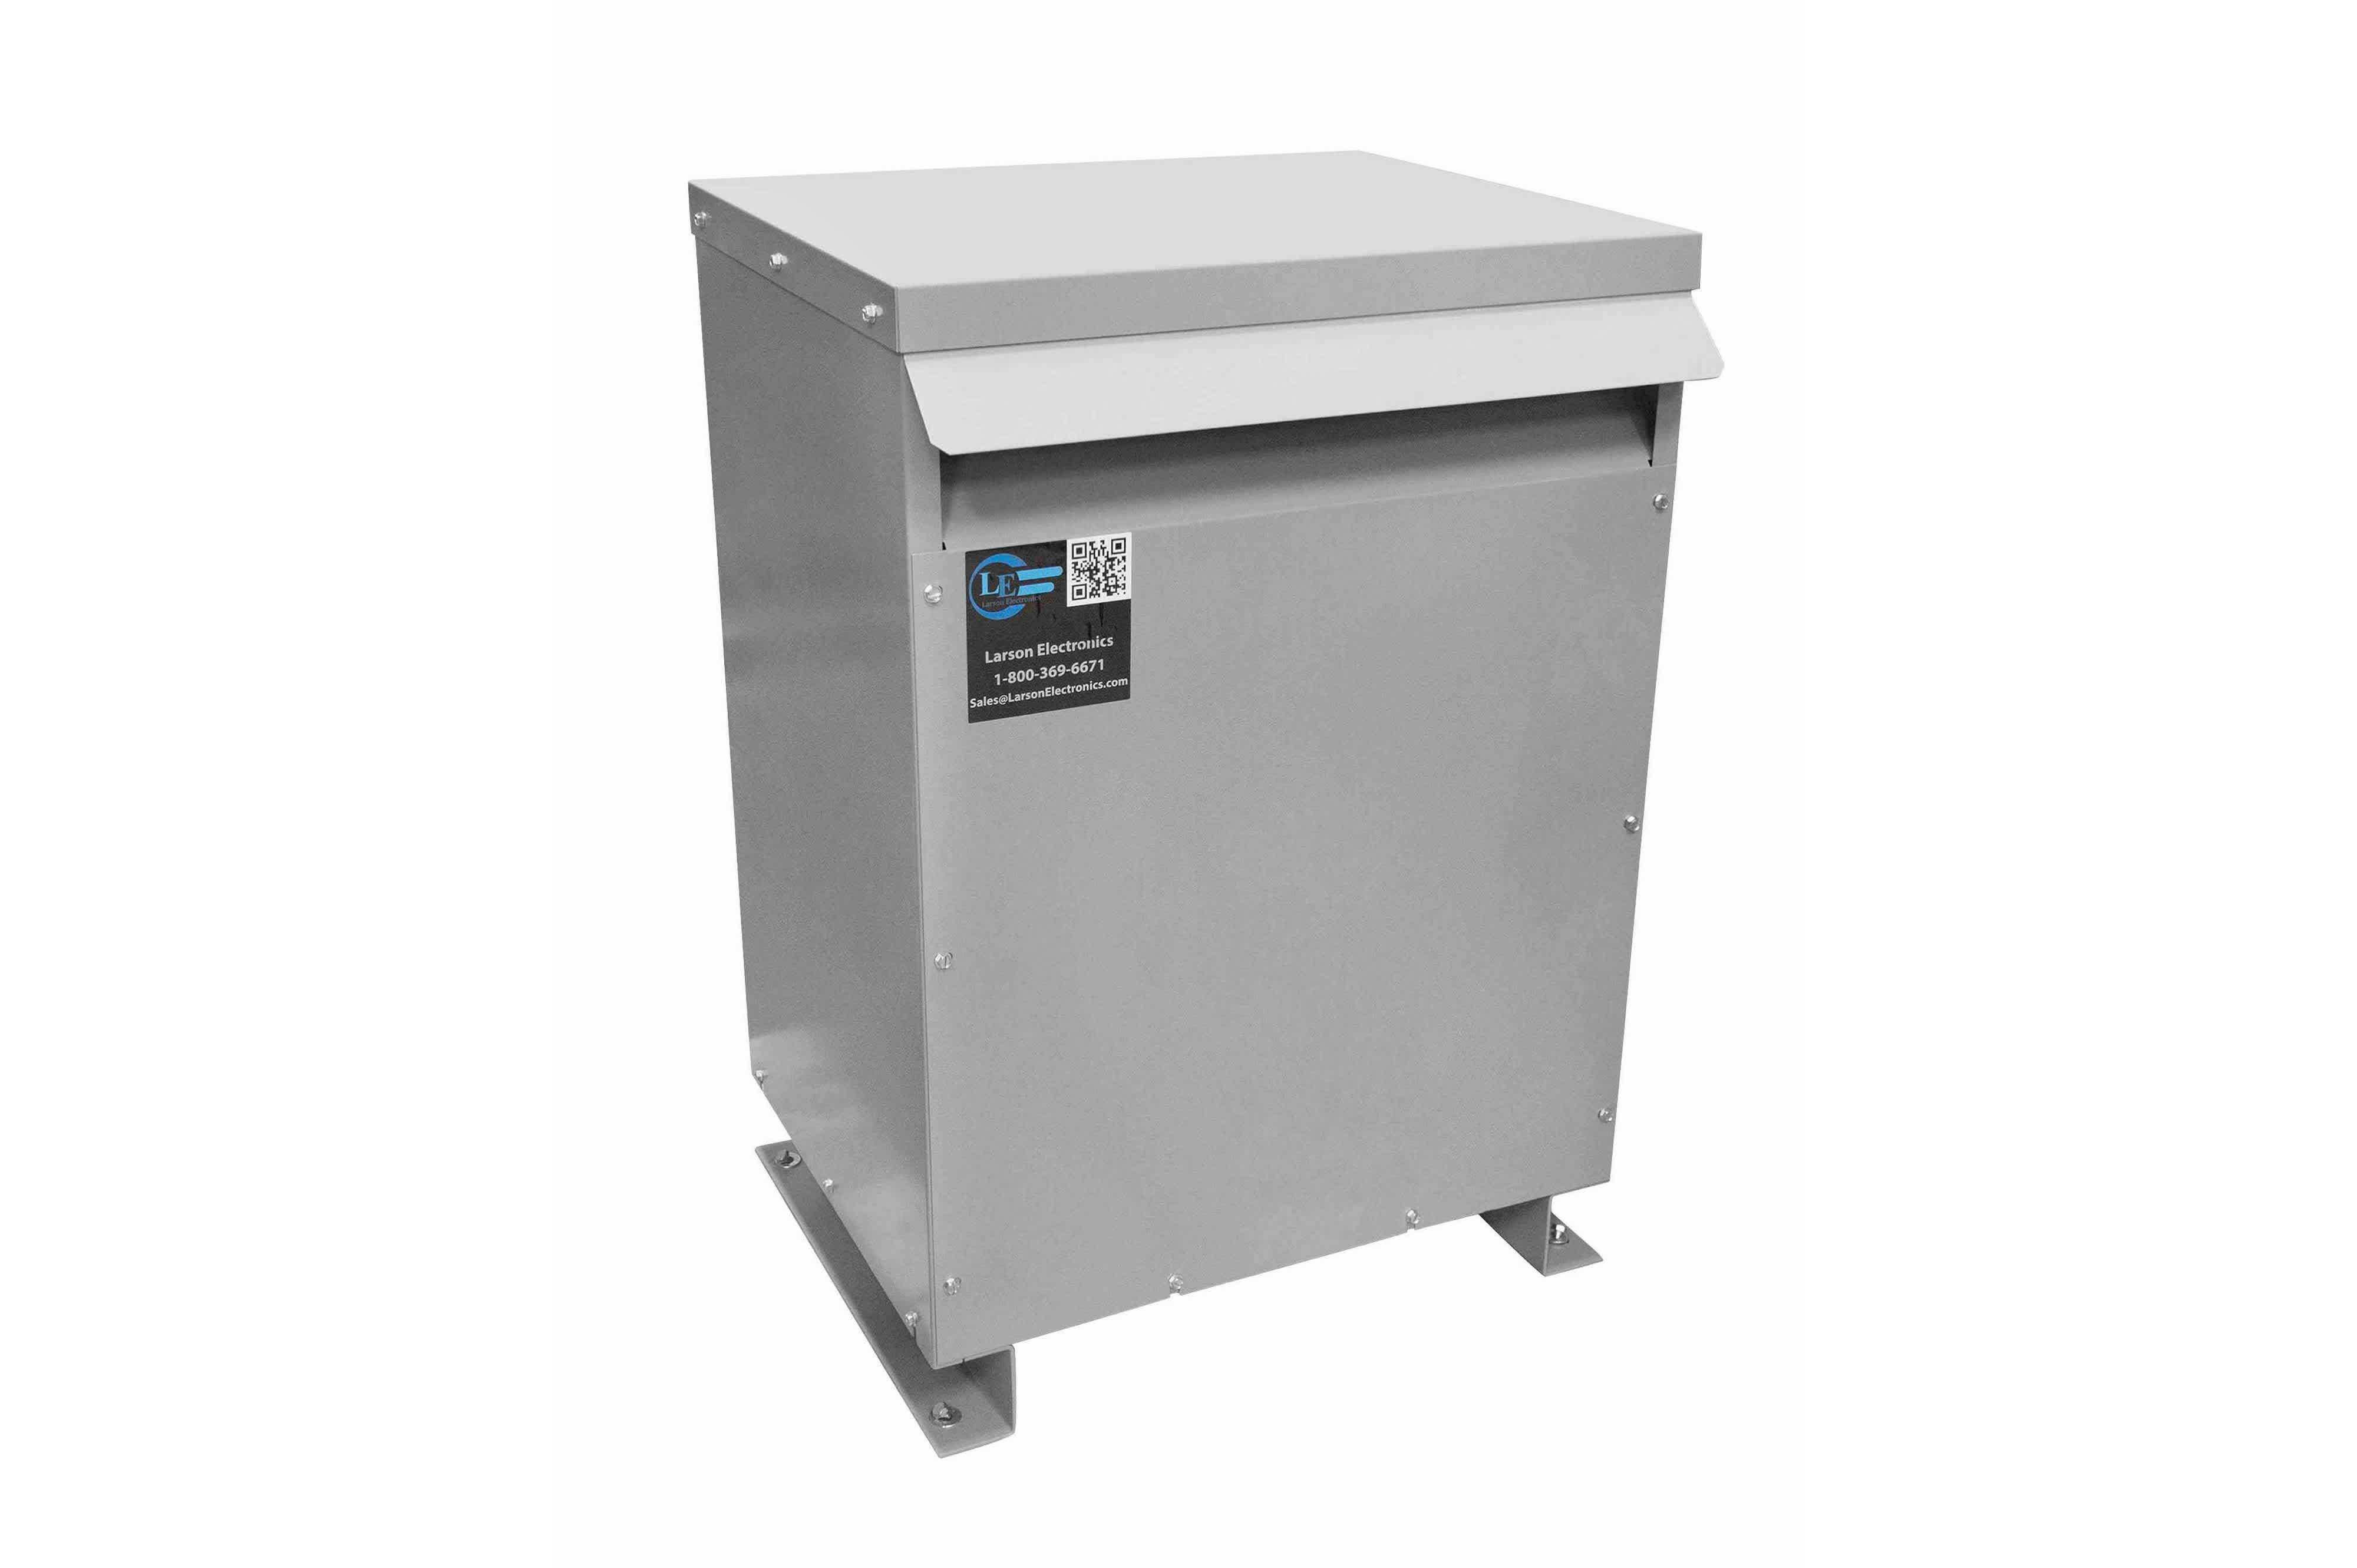 150 kVA 3PH Isolation Transformer, 415V Wye Primary, 480V Delta Secondary, N3R, Ventilated, 60 Hz